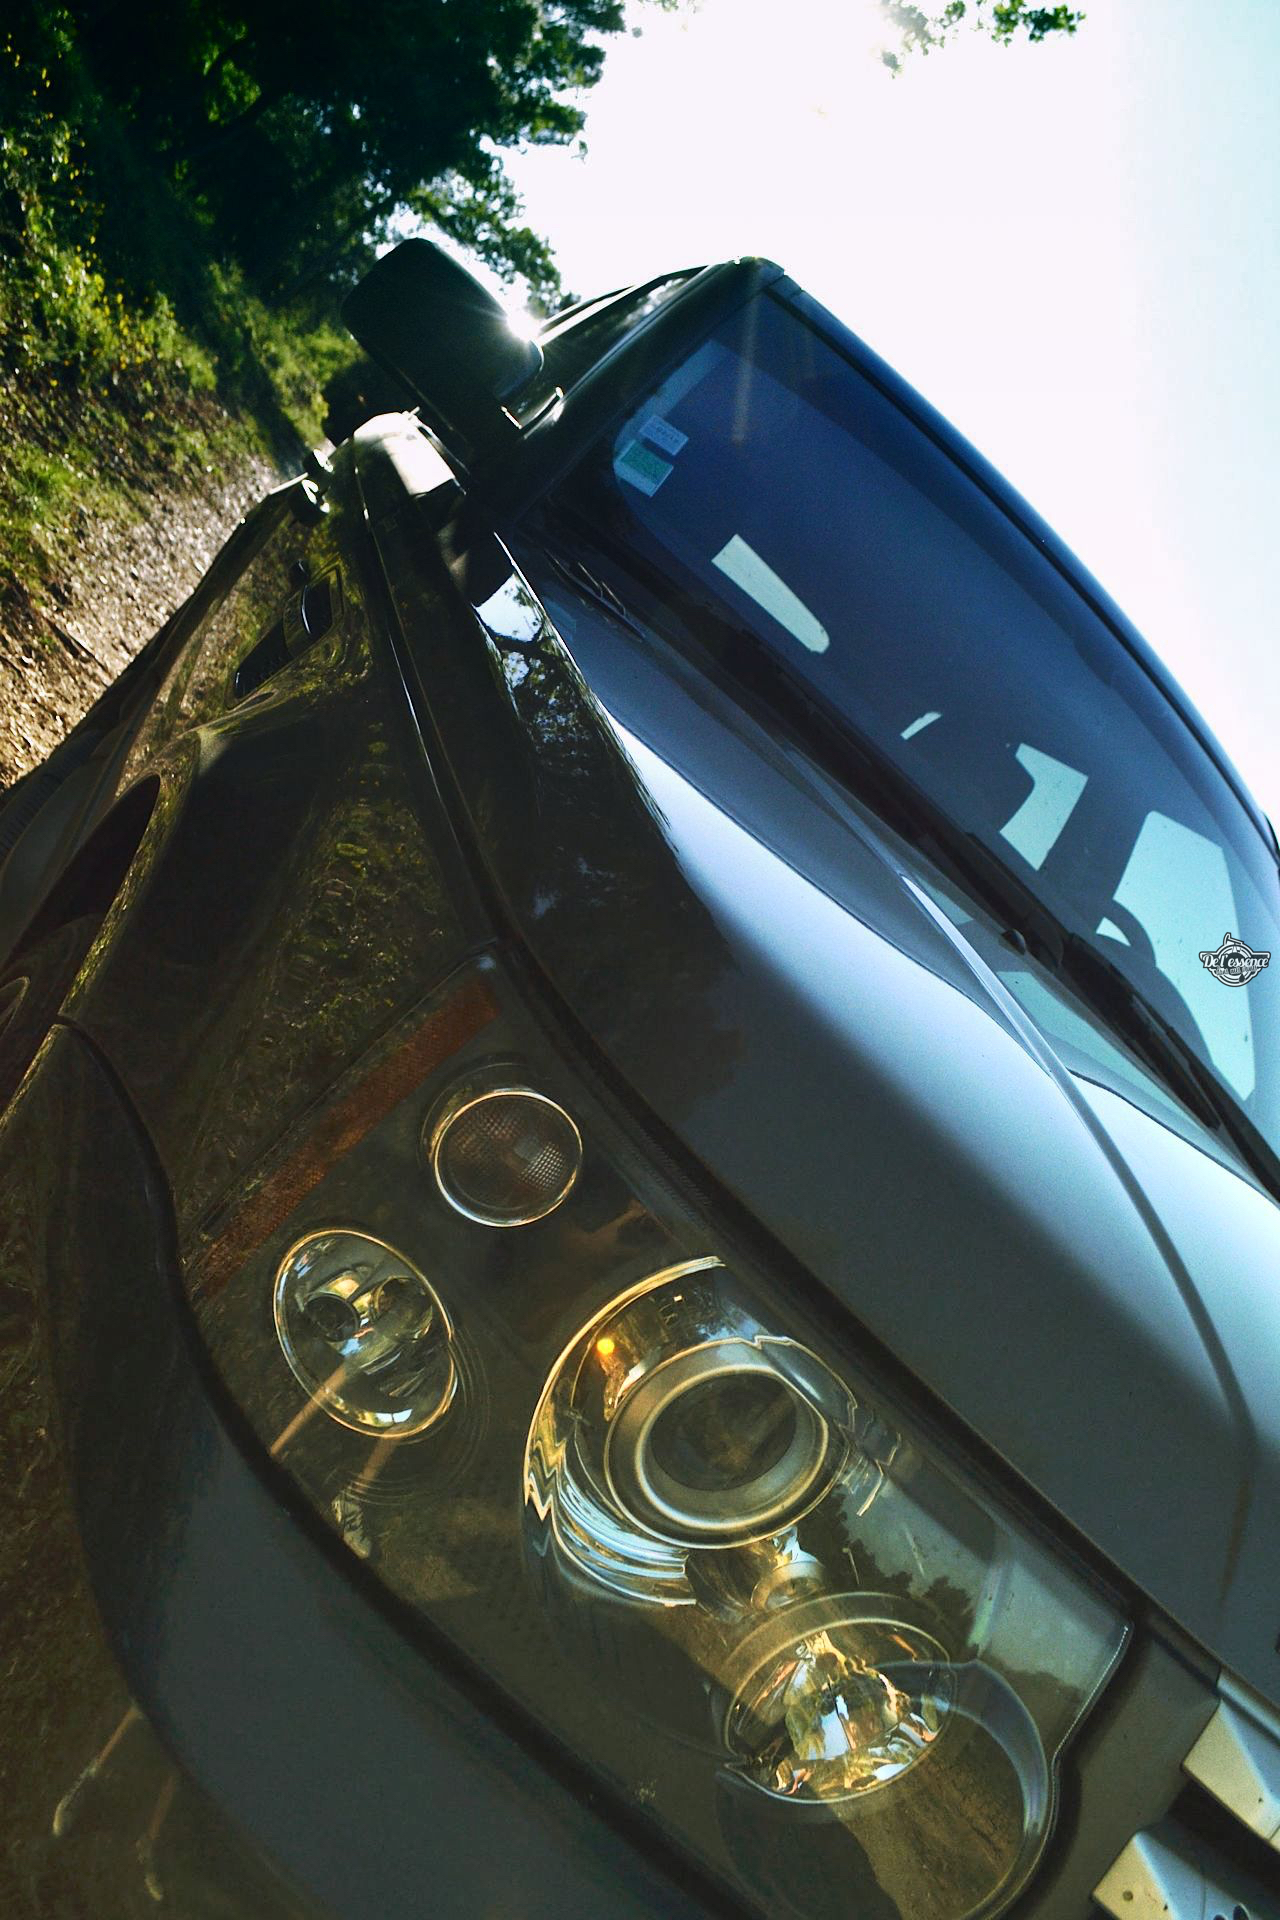 Range Rover Sport V8 Supercharged... Il est pas vert Hulk ?! 20